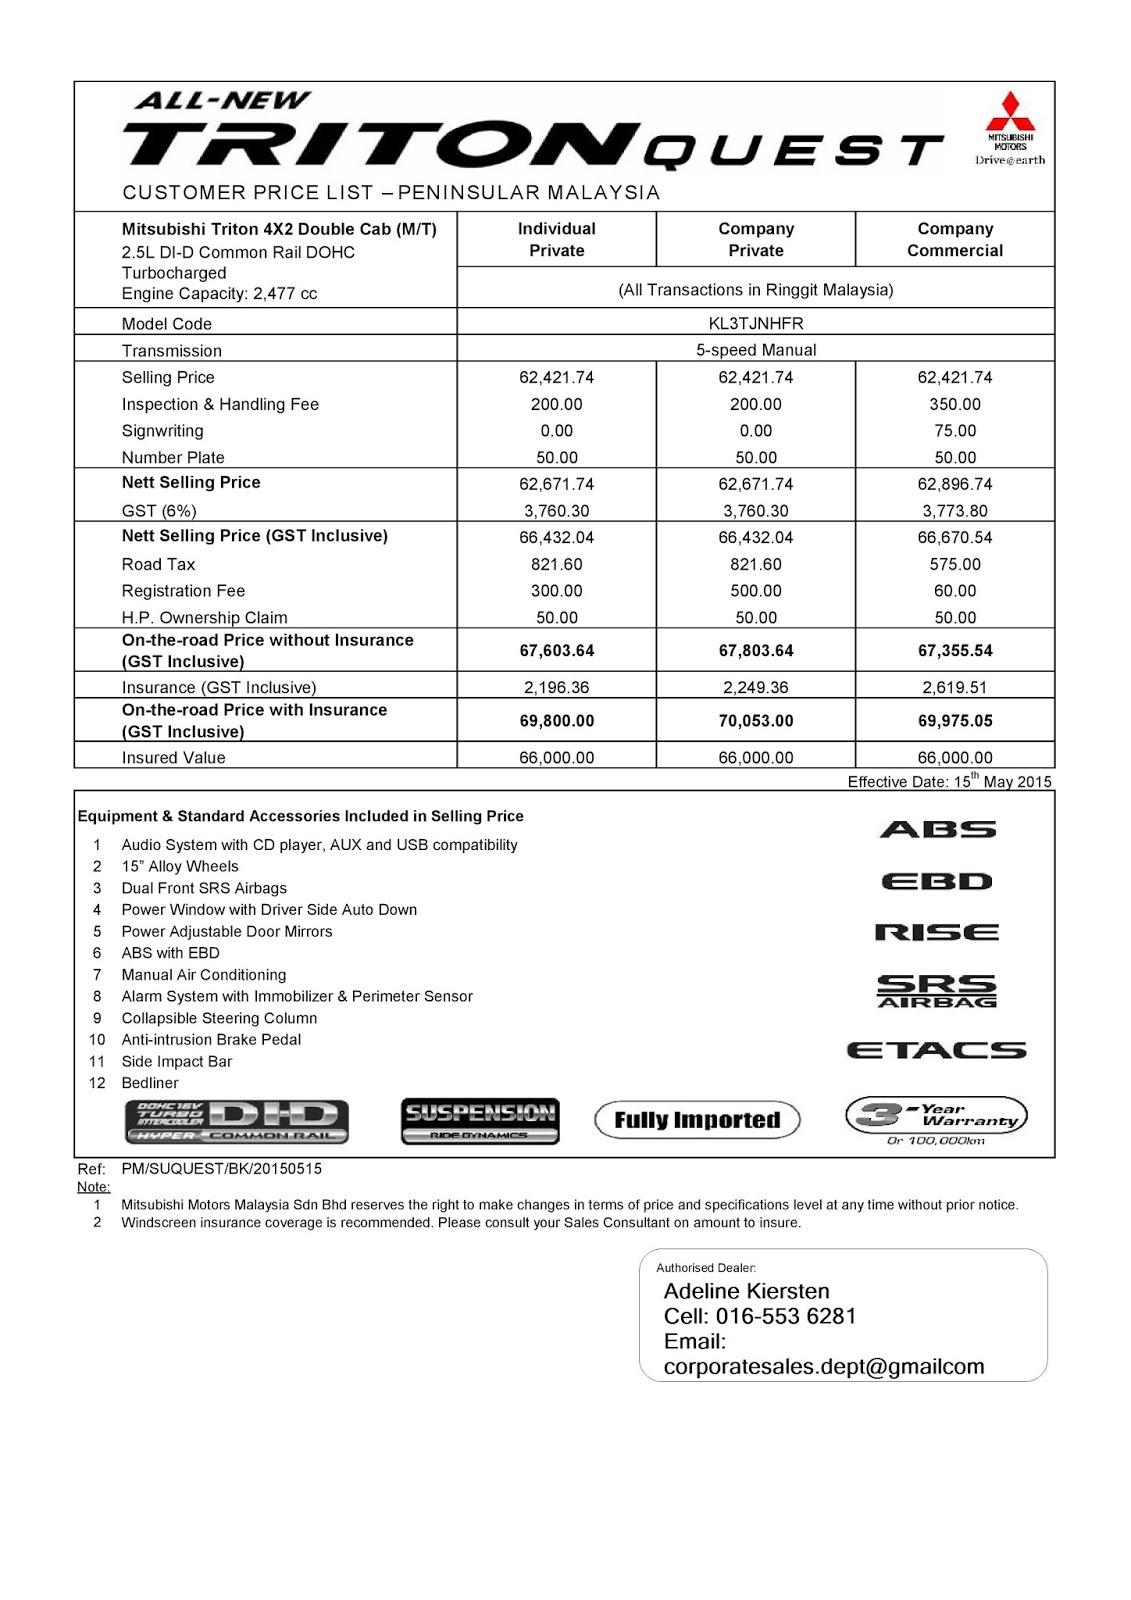 Mitsubishi Triton: Price List